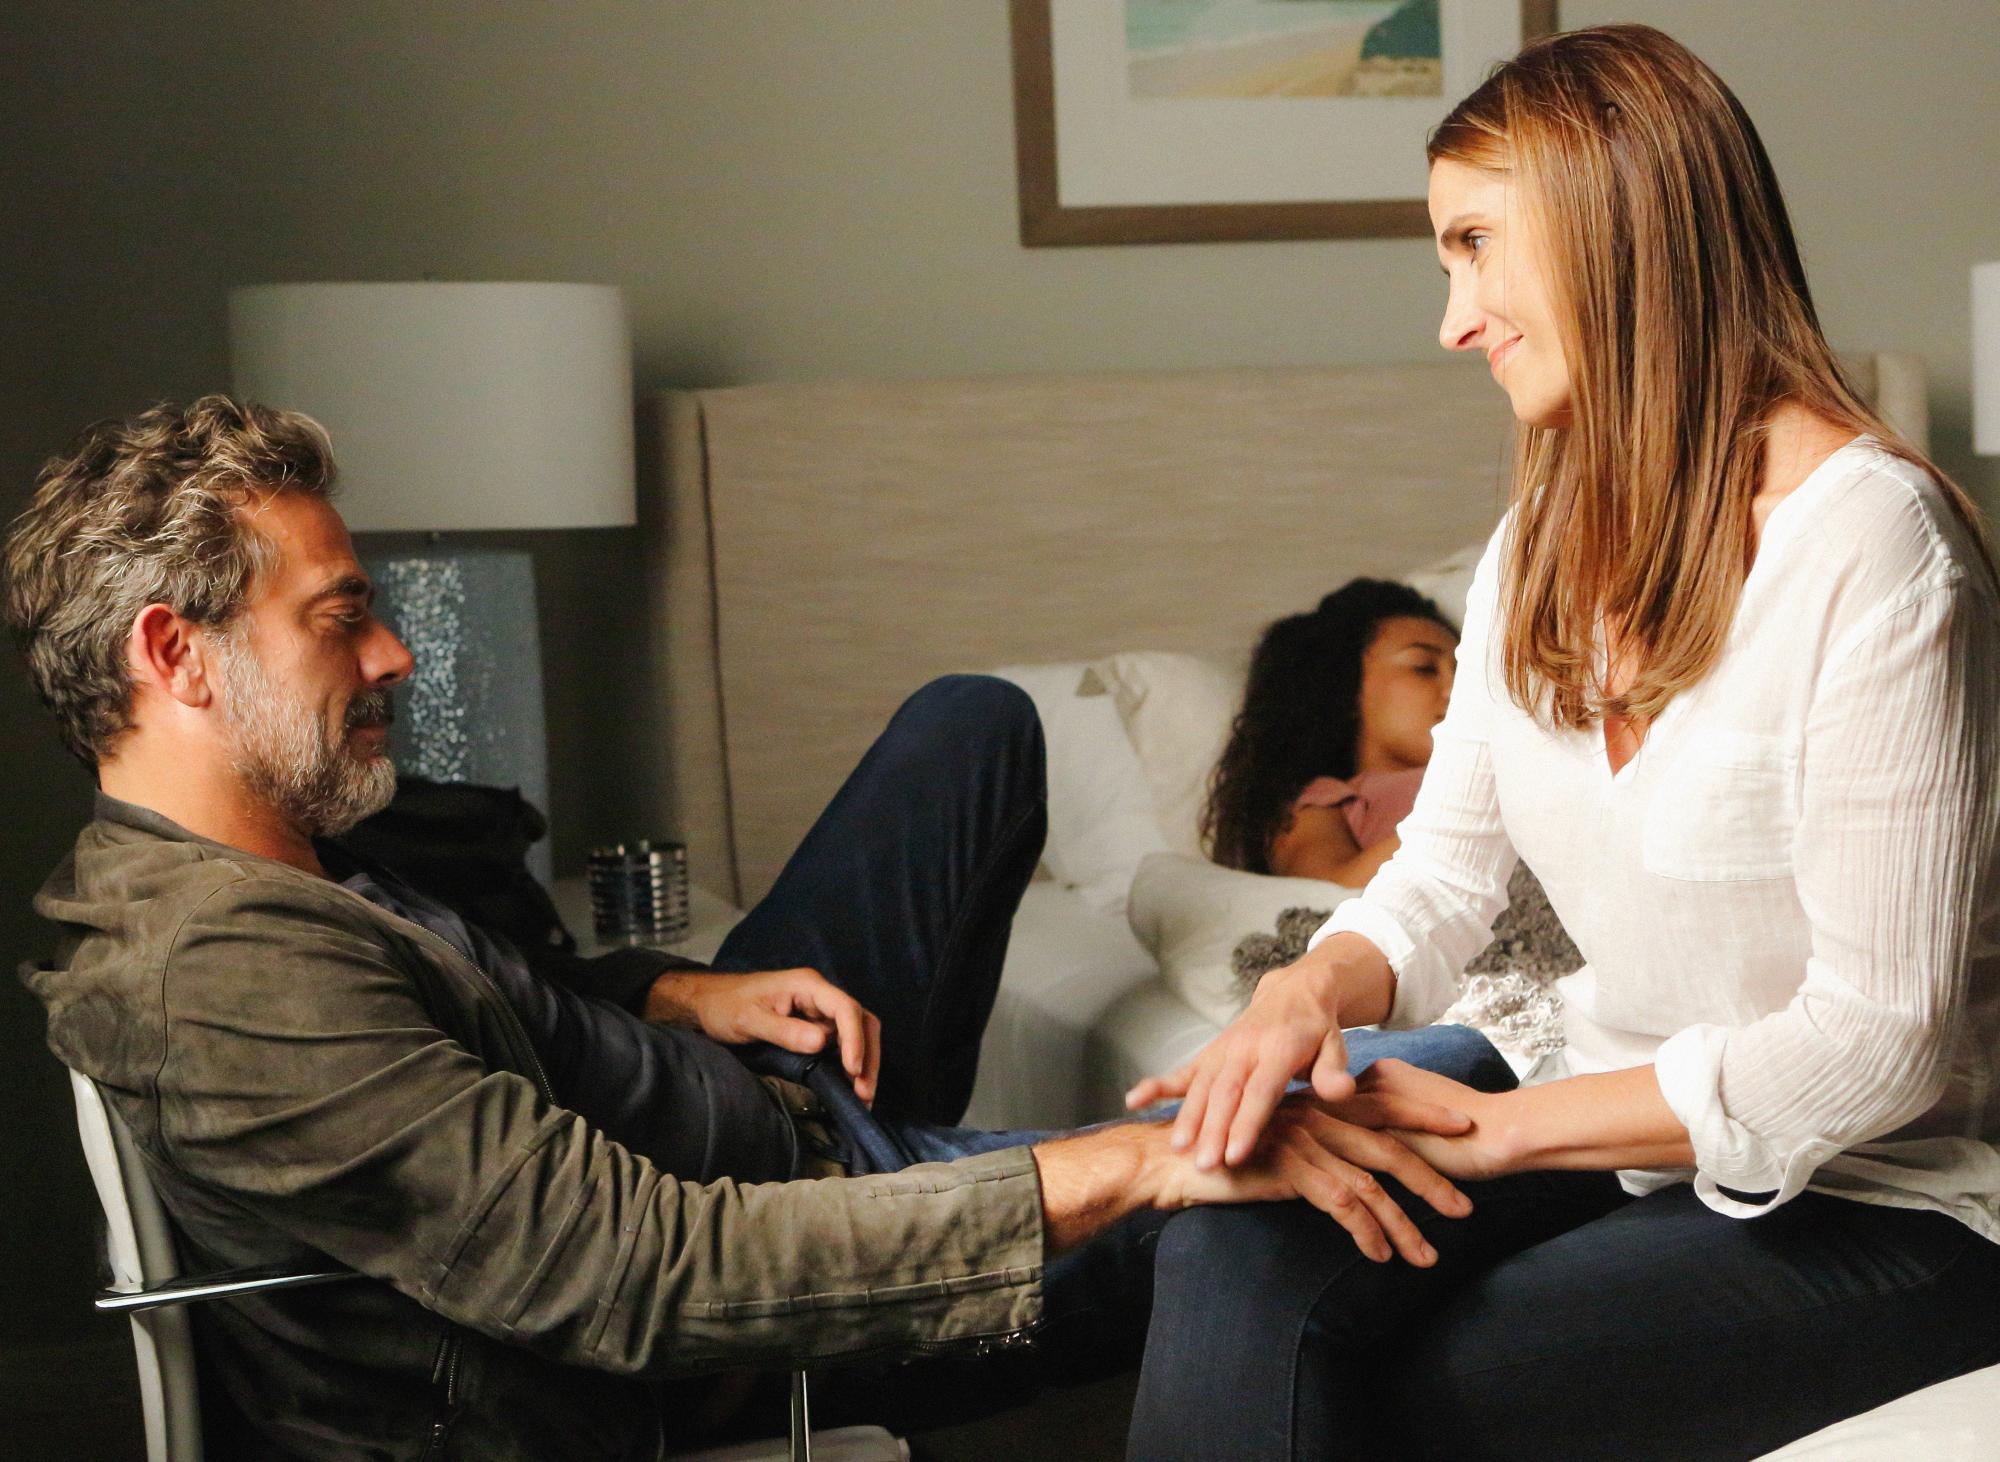 Jeffrey Dean Morgan as JD Richter, McKenna Roberts as Terra, and Melina Kanakaredes.